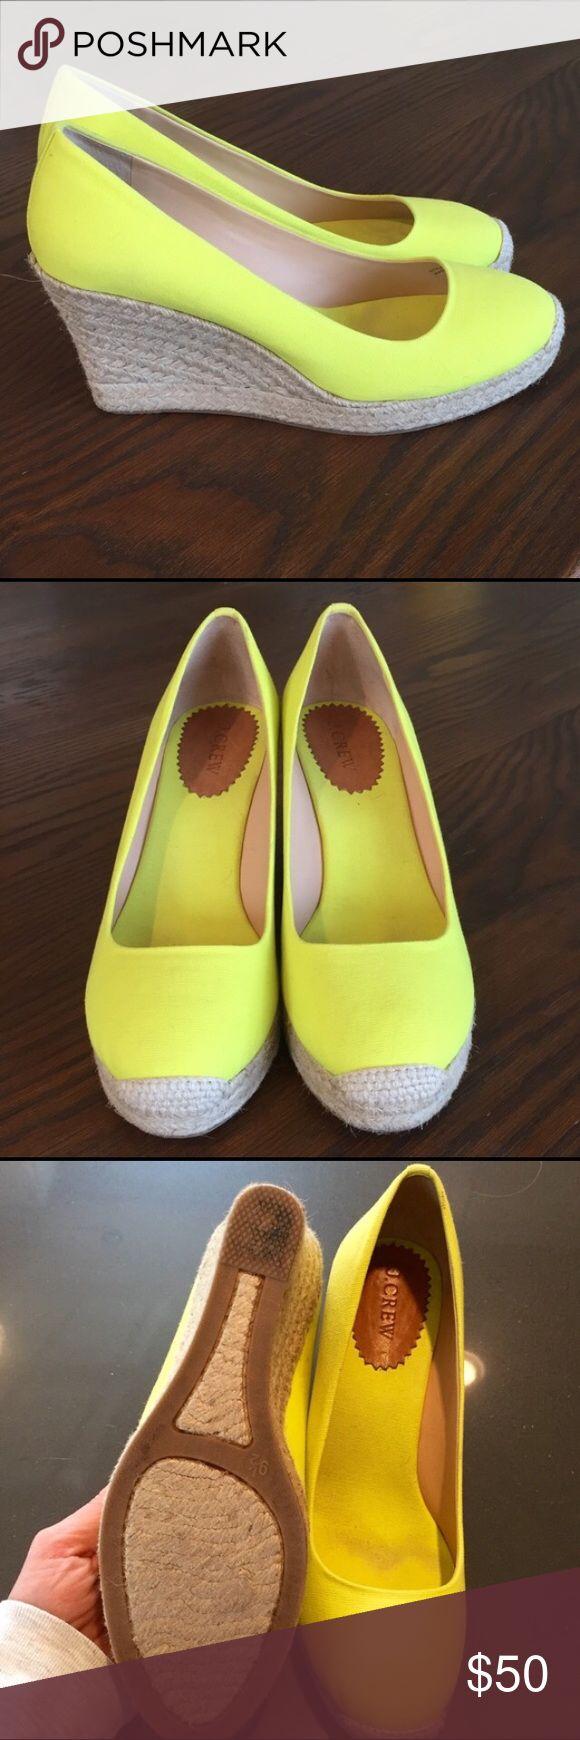 J. Crew Neon Yellow Espadrilles J. Crew Neon Yellow Espadrilles wedges. Super cute. Worn twice. J. Crew Shoes Espadrilles